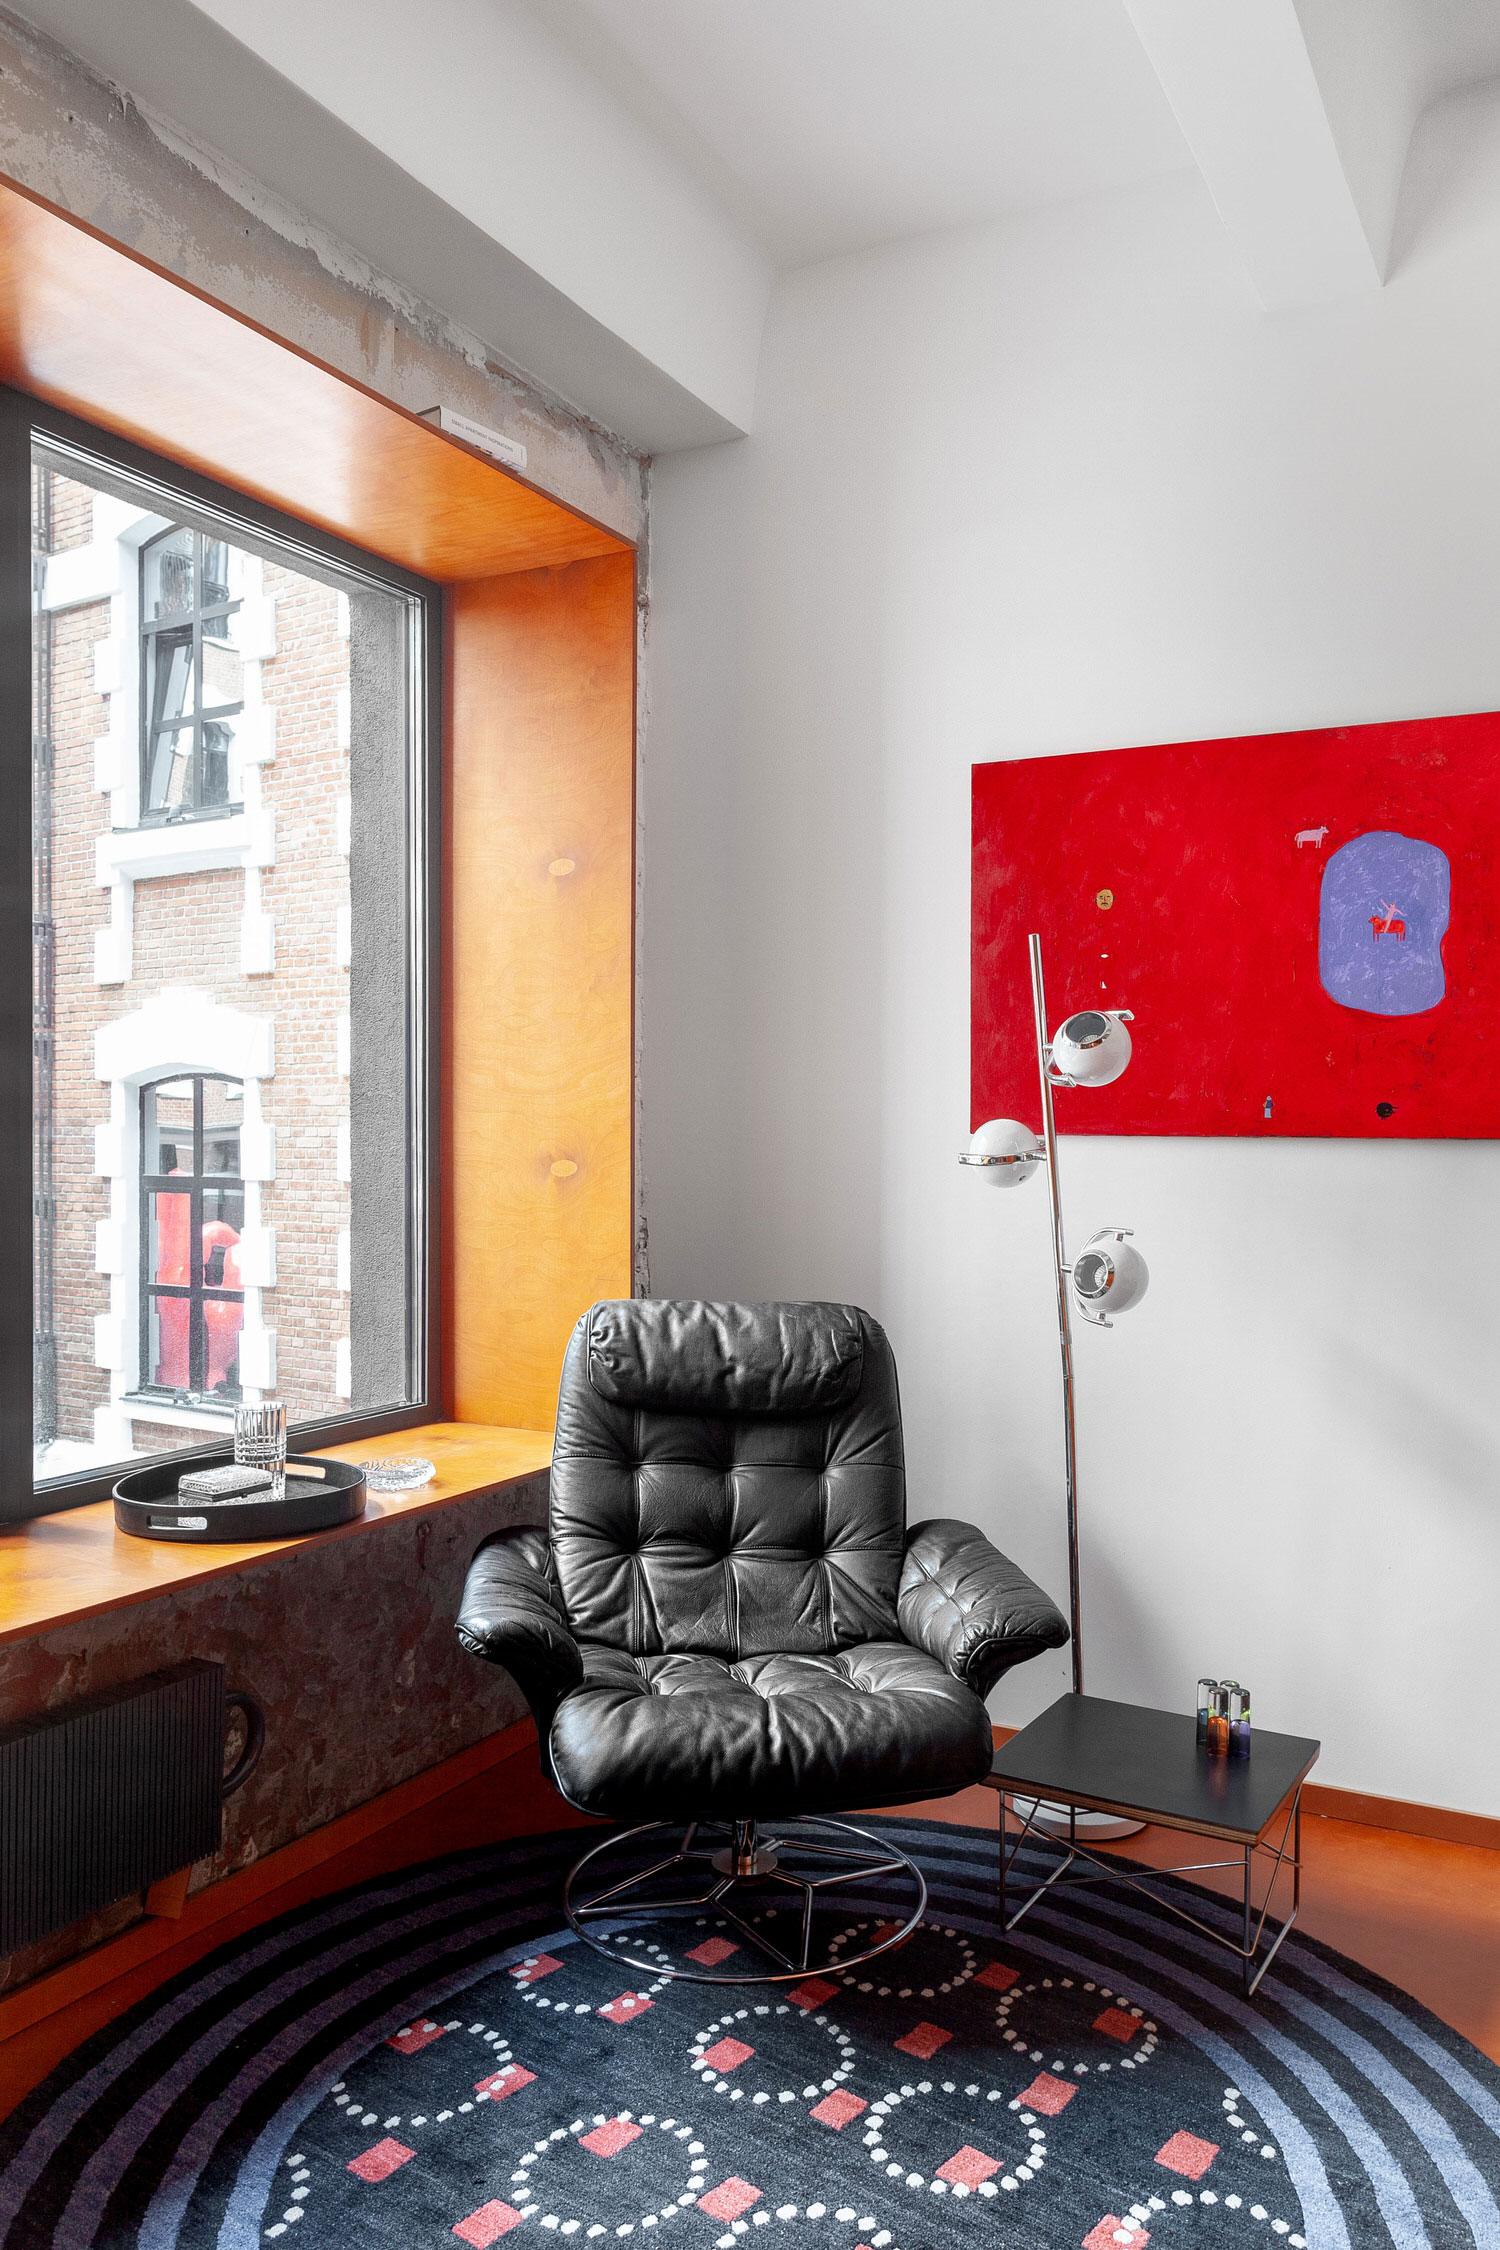 Room Design Buro Commune 303 Tiny Moscow Apartment Interior Photo Polina Poludkina Yellowtrace 15